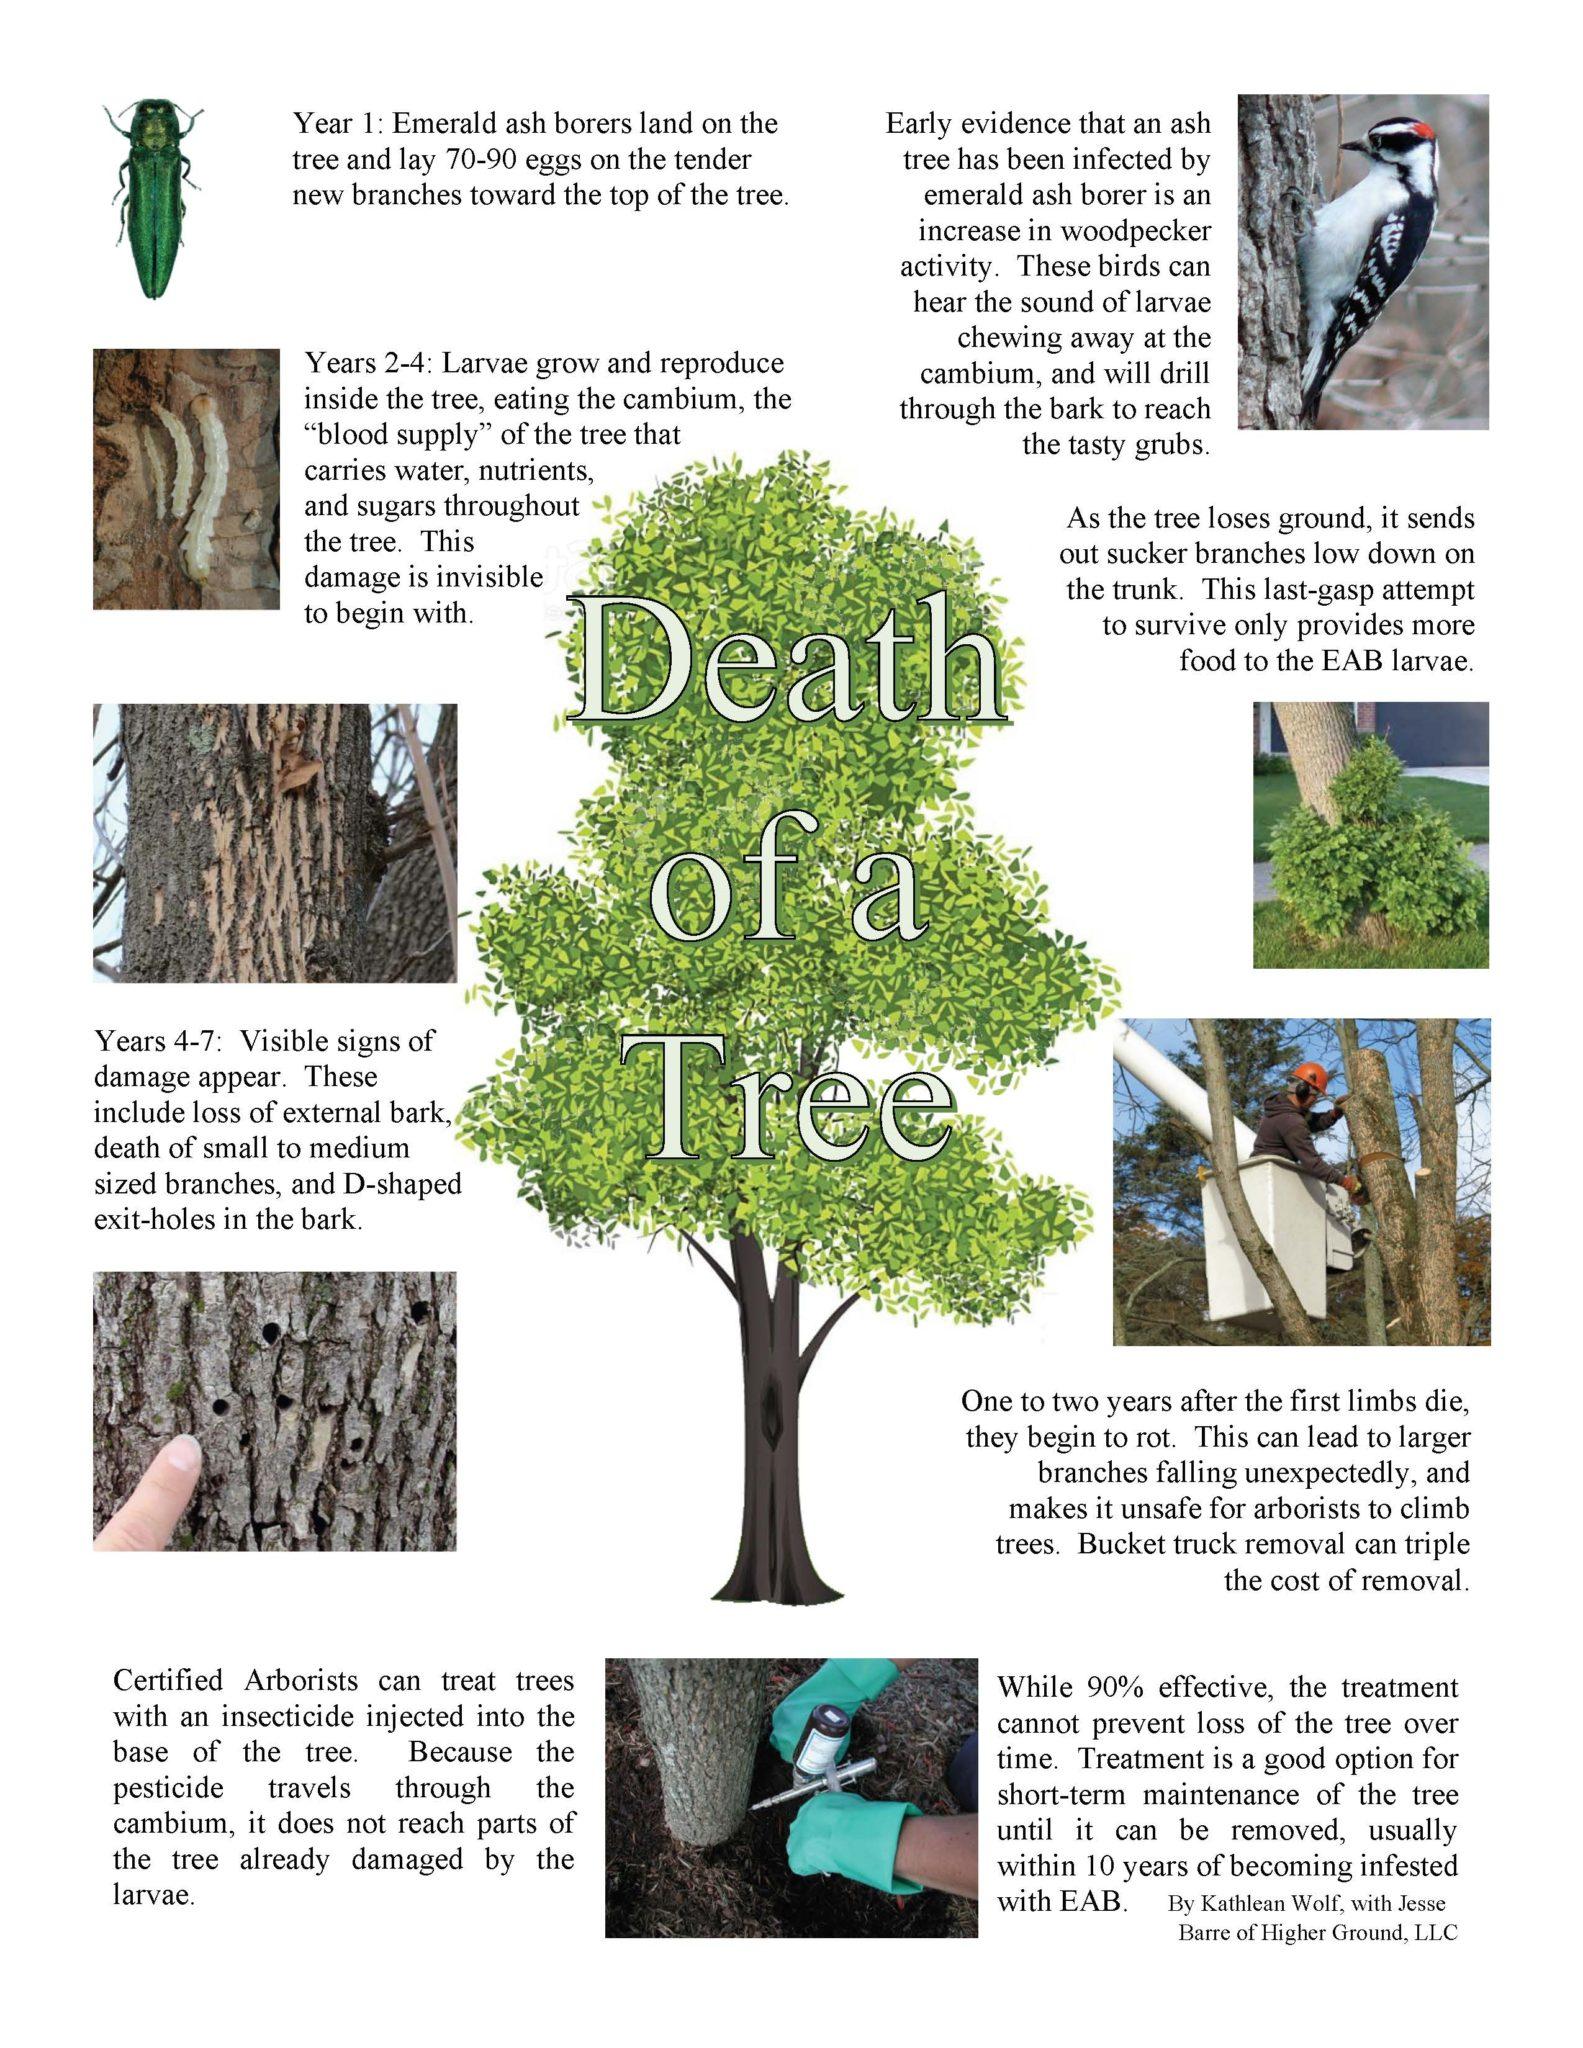 Failing ash trees threaten homes | Northside News